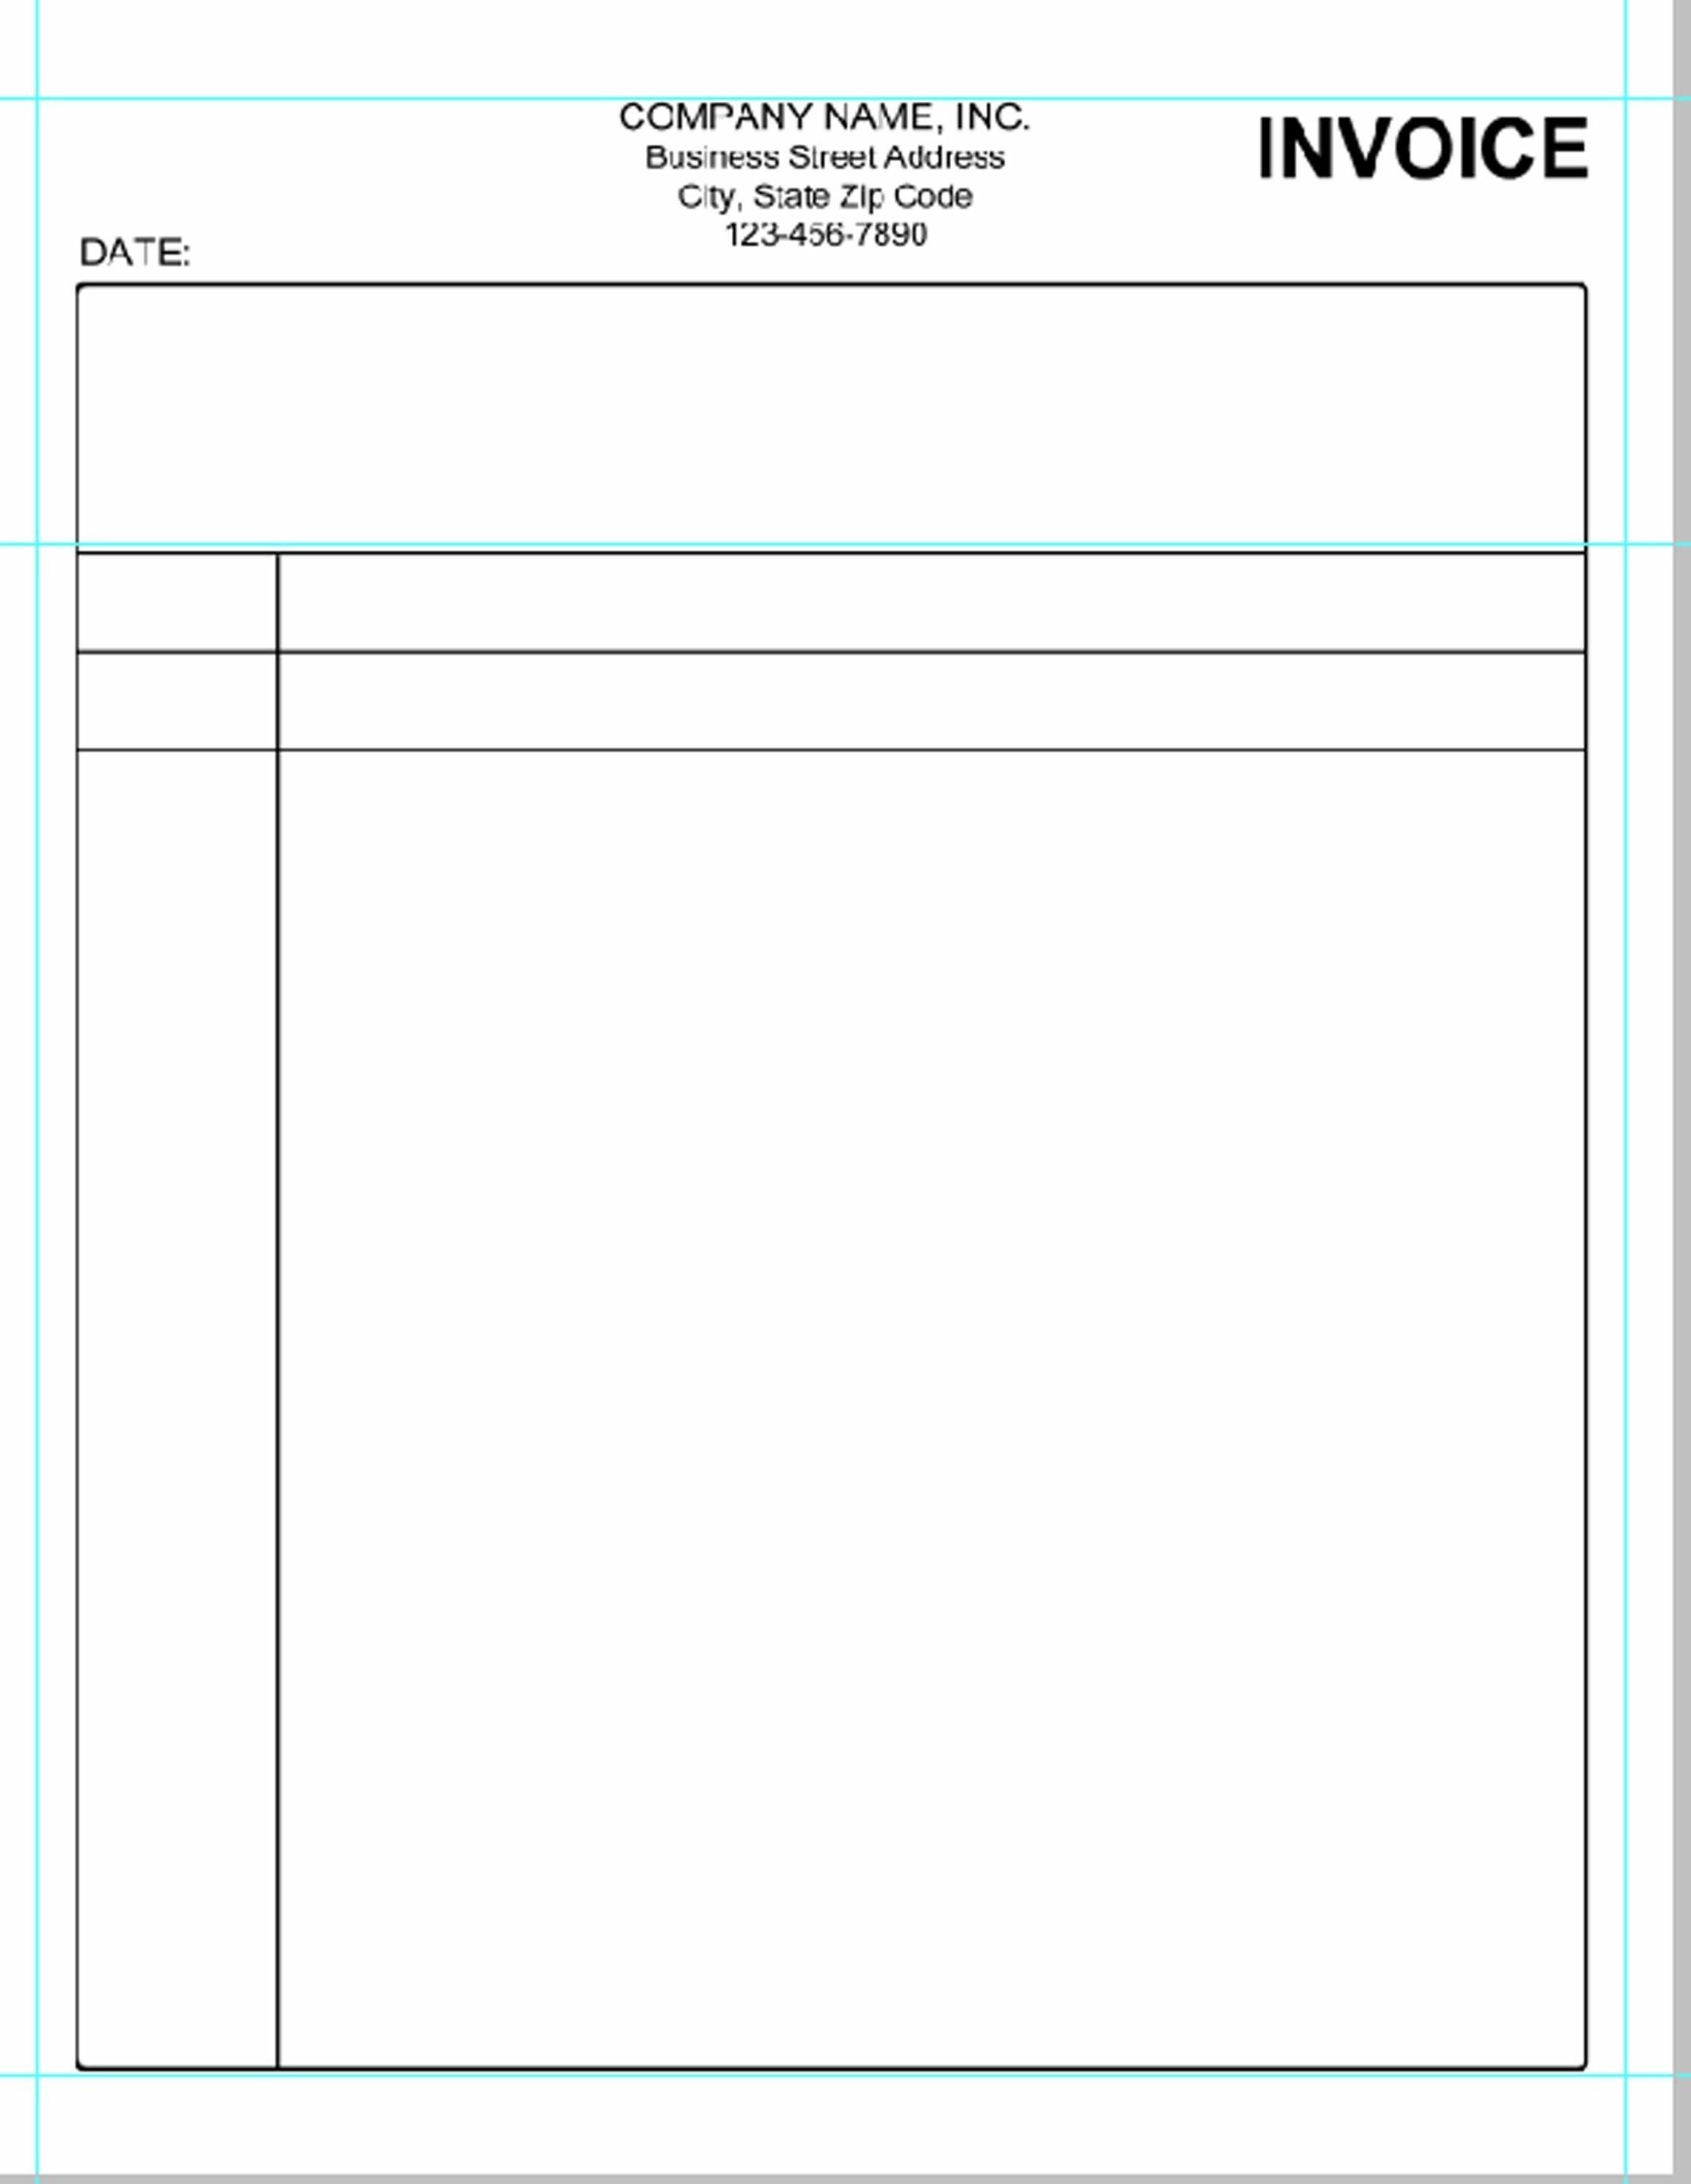 Print Blank Invoice Unique Free Printable Blank Invoice Sheet - Free Printable Blank Invoice